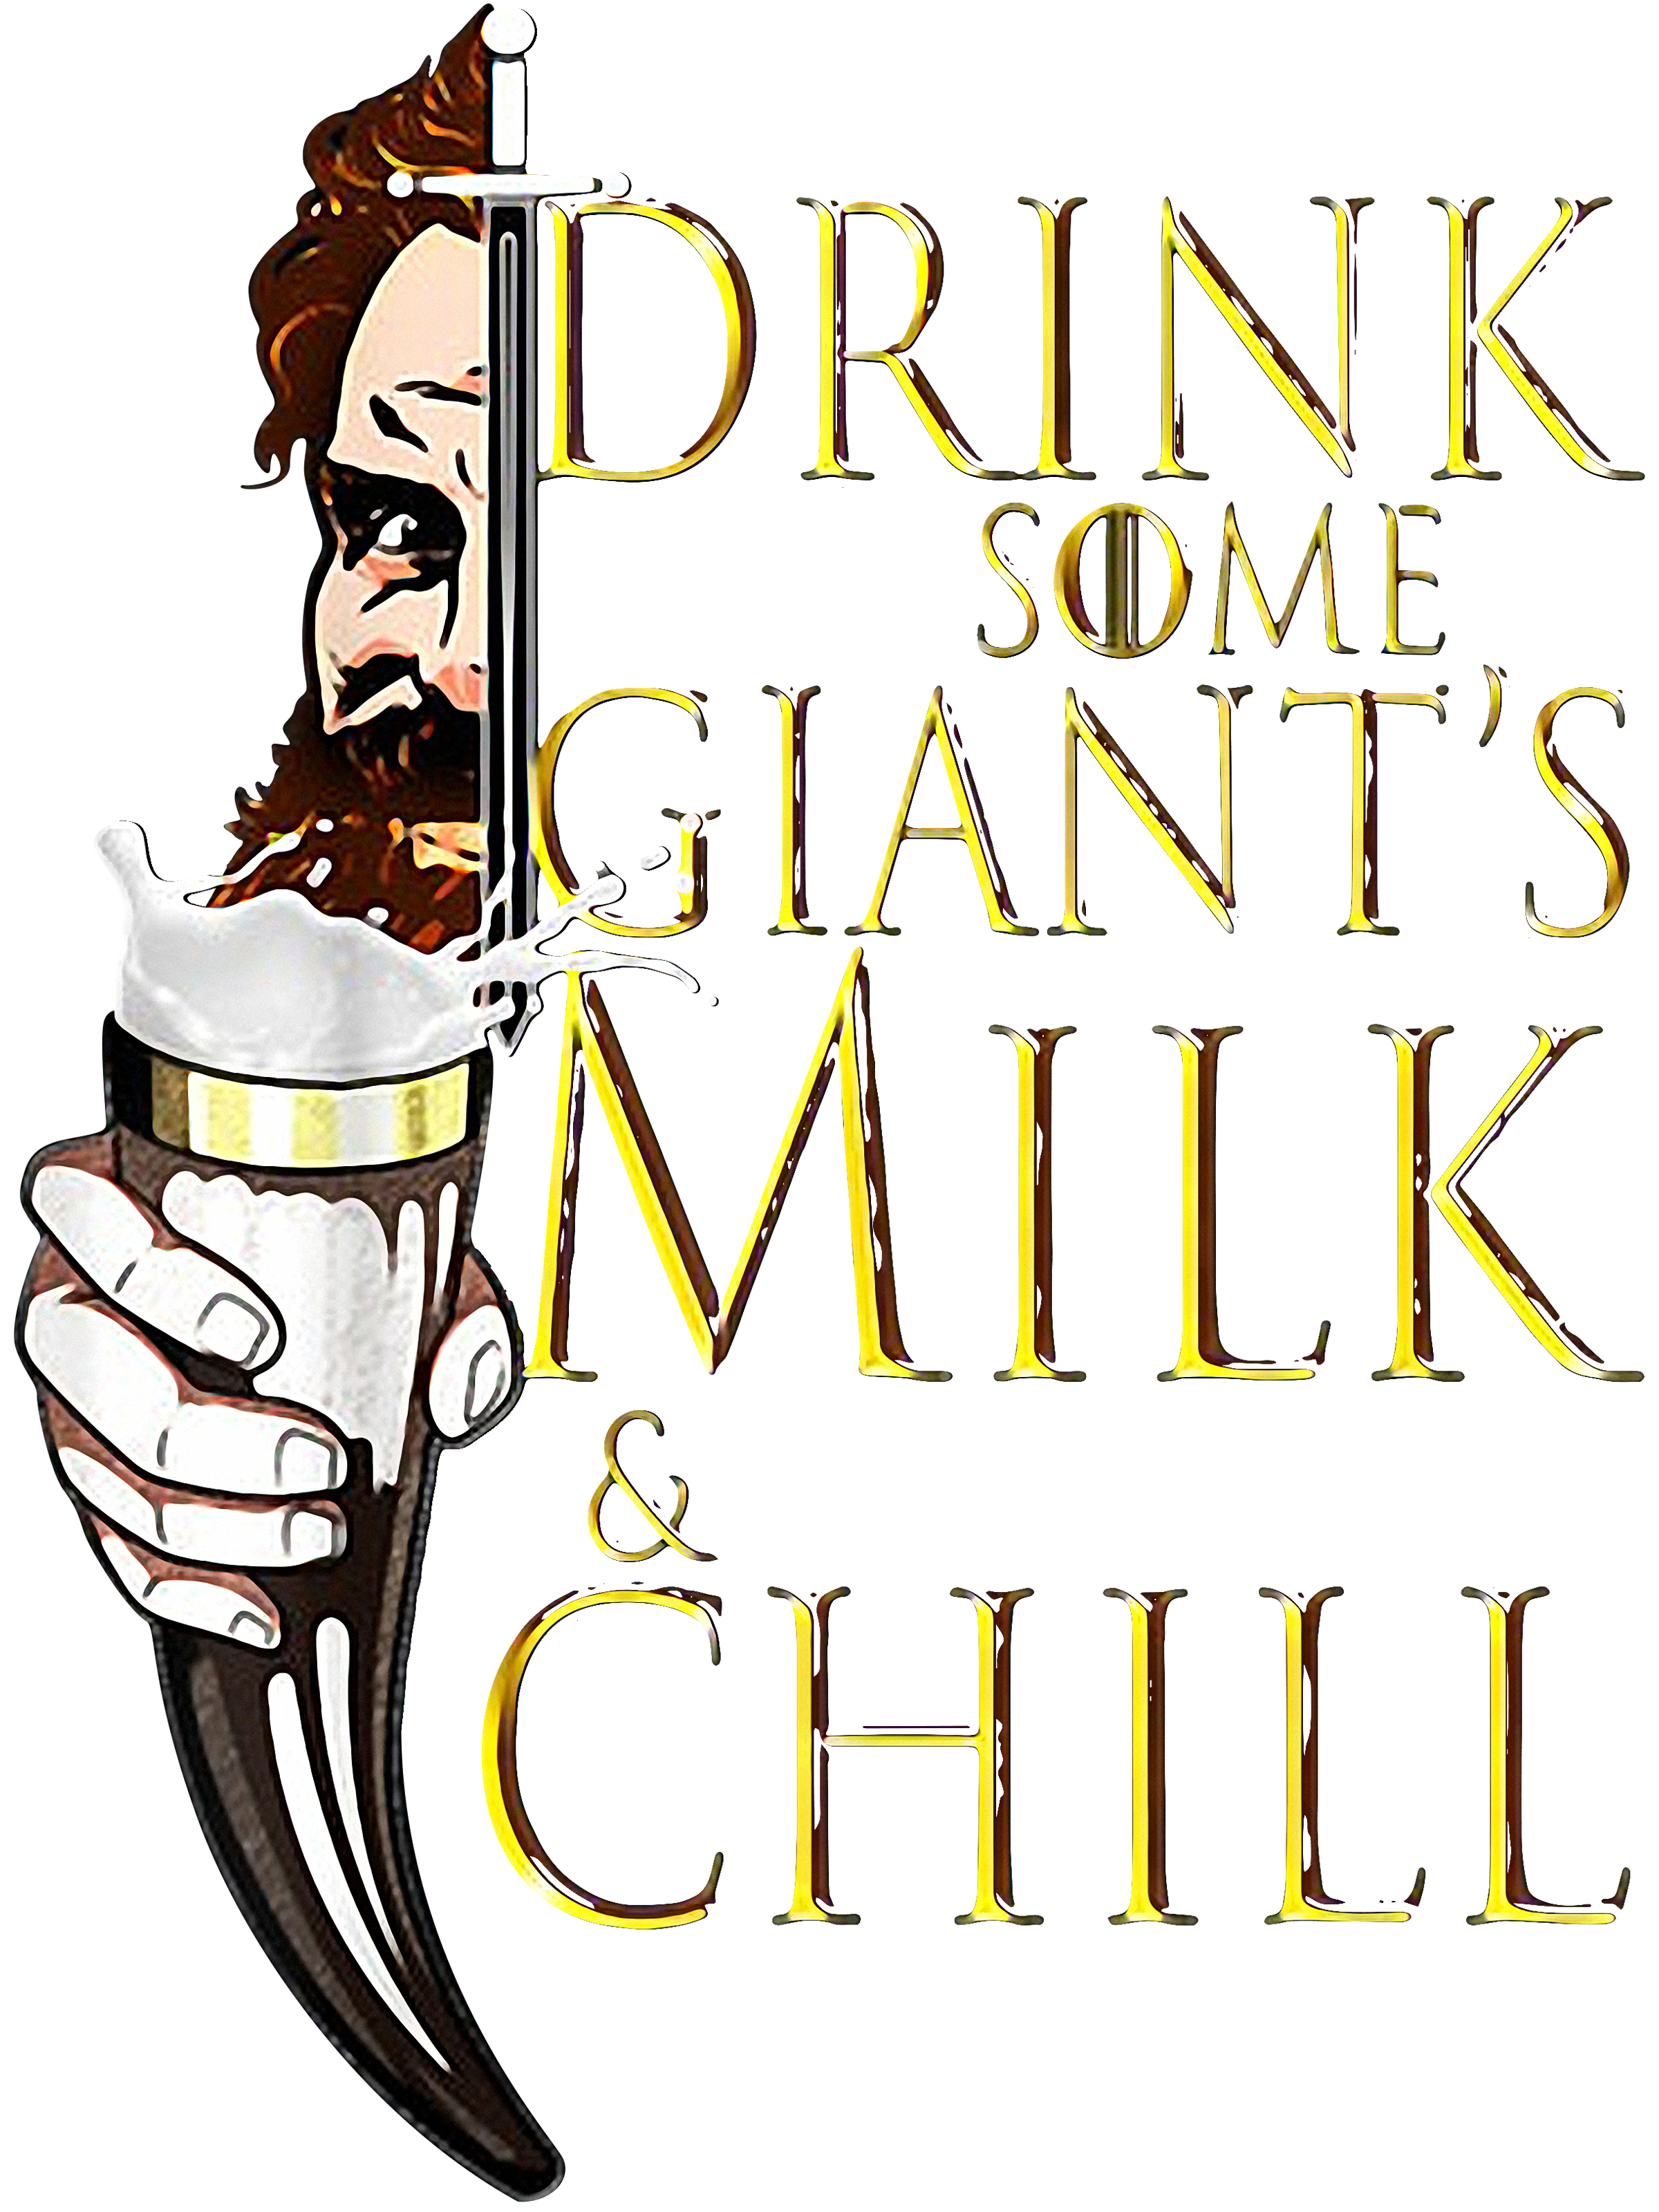 1cb3e0dd6 Game Of Thrones Tormund Giantsbane drink some Giant's milk and chill shirt